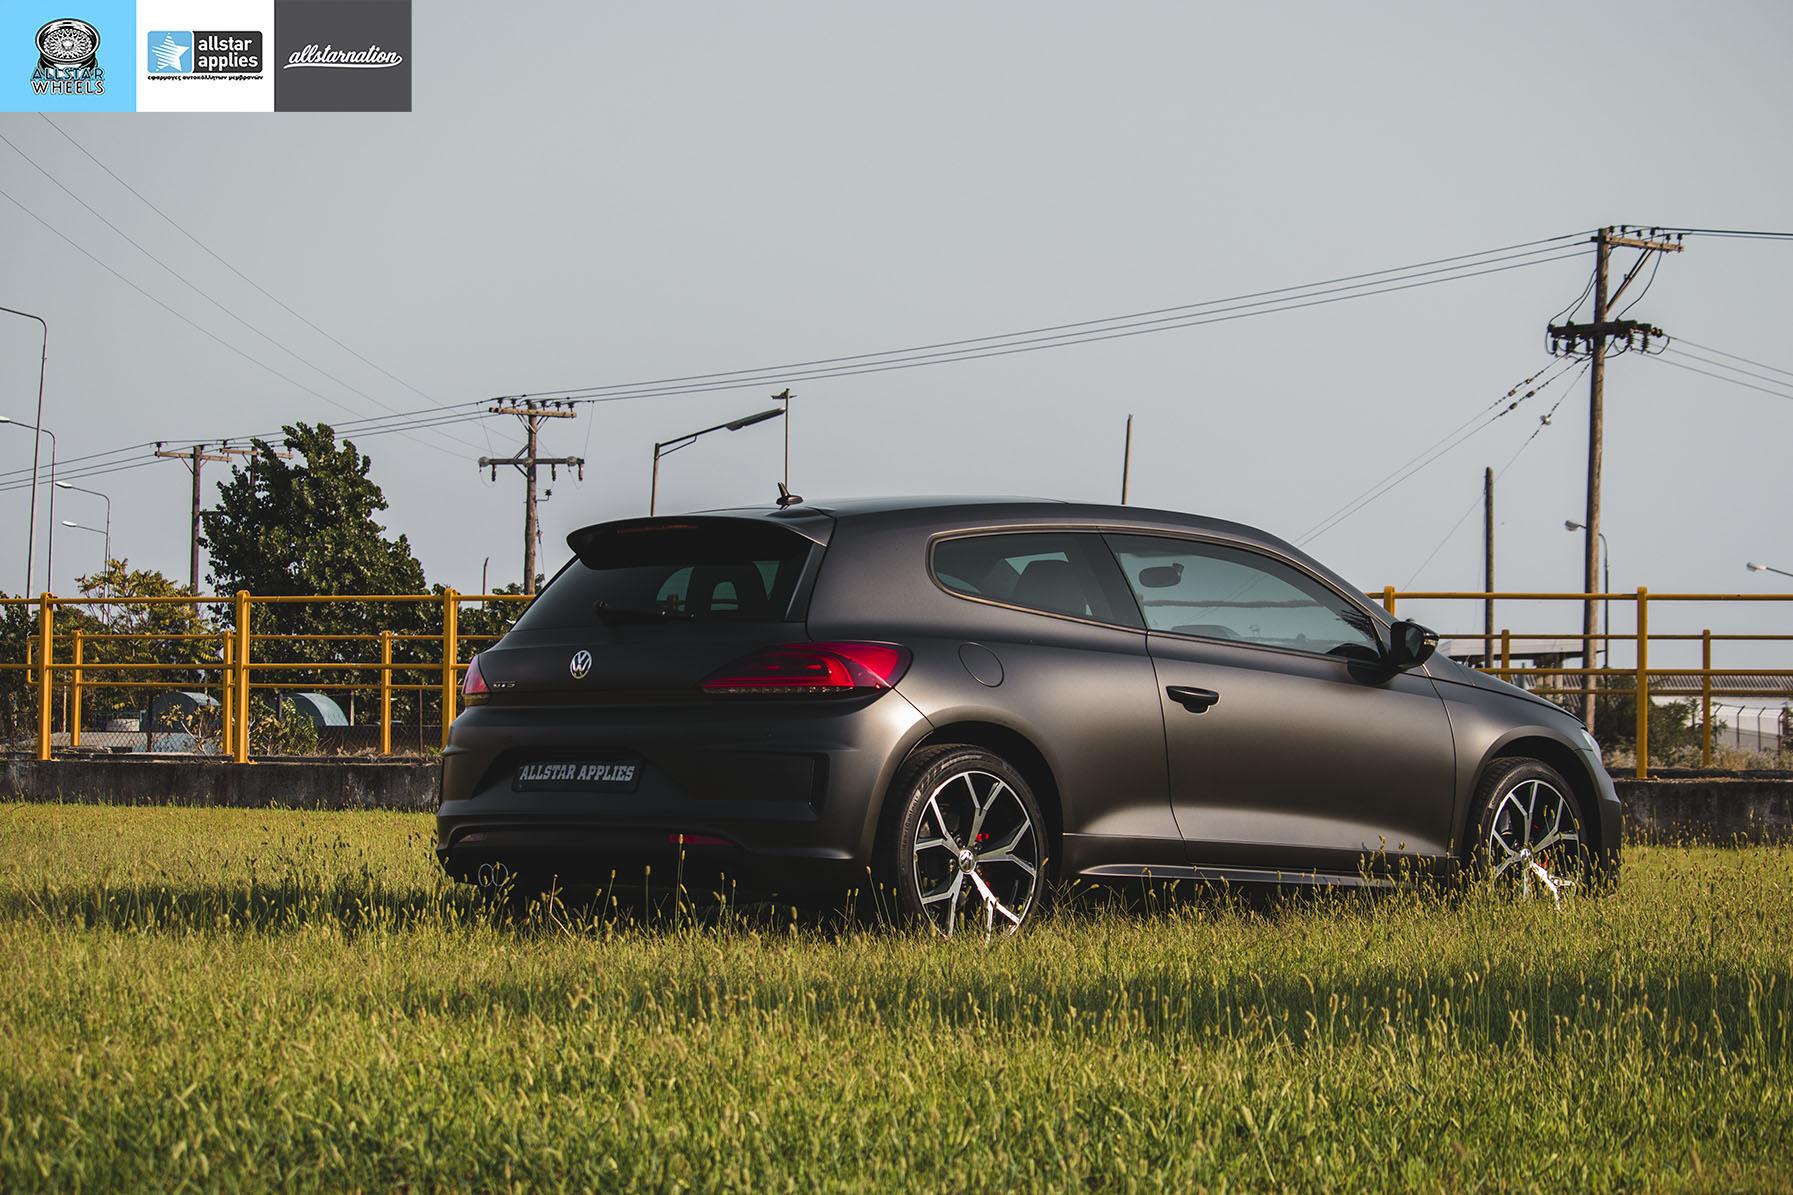 VW SCIROCCO MATT DIAMOND BLACK ALLSTAR APPLIES (7)